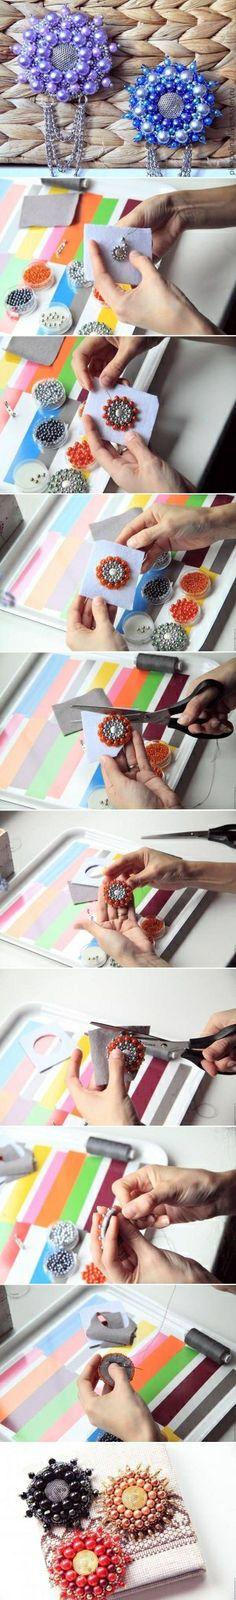 DIY Beads Flower Brooch DIY Projects | UsefulDIY.com by eleanor